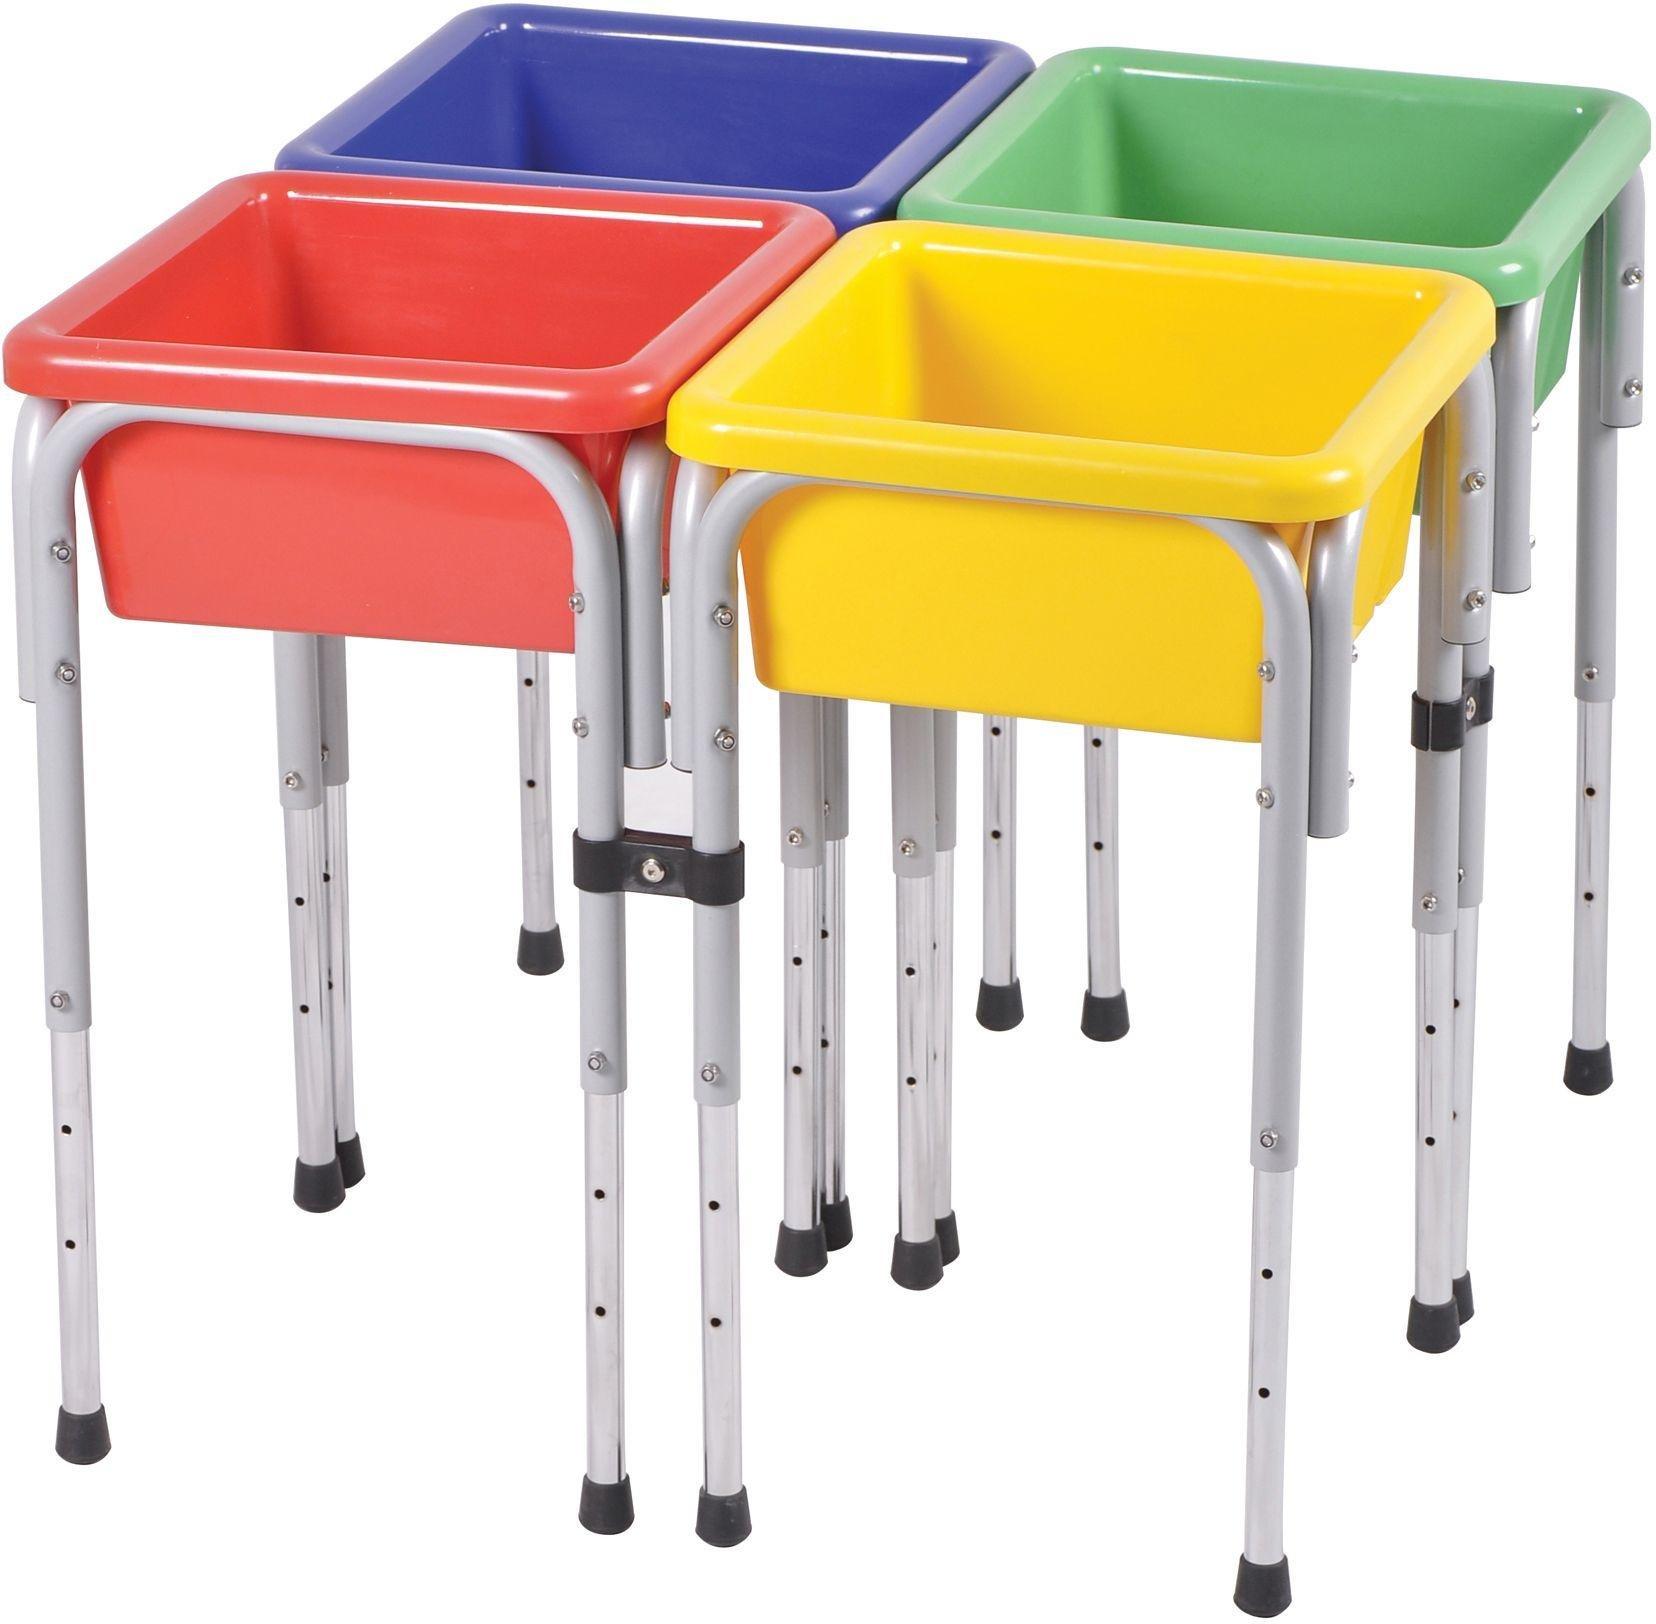 Image of Play Tubs Set.